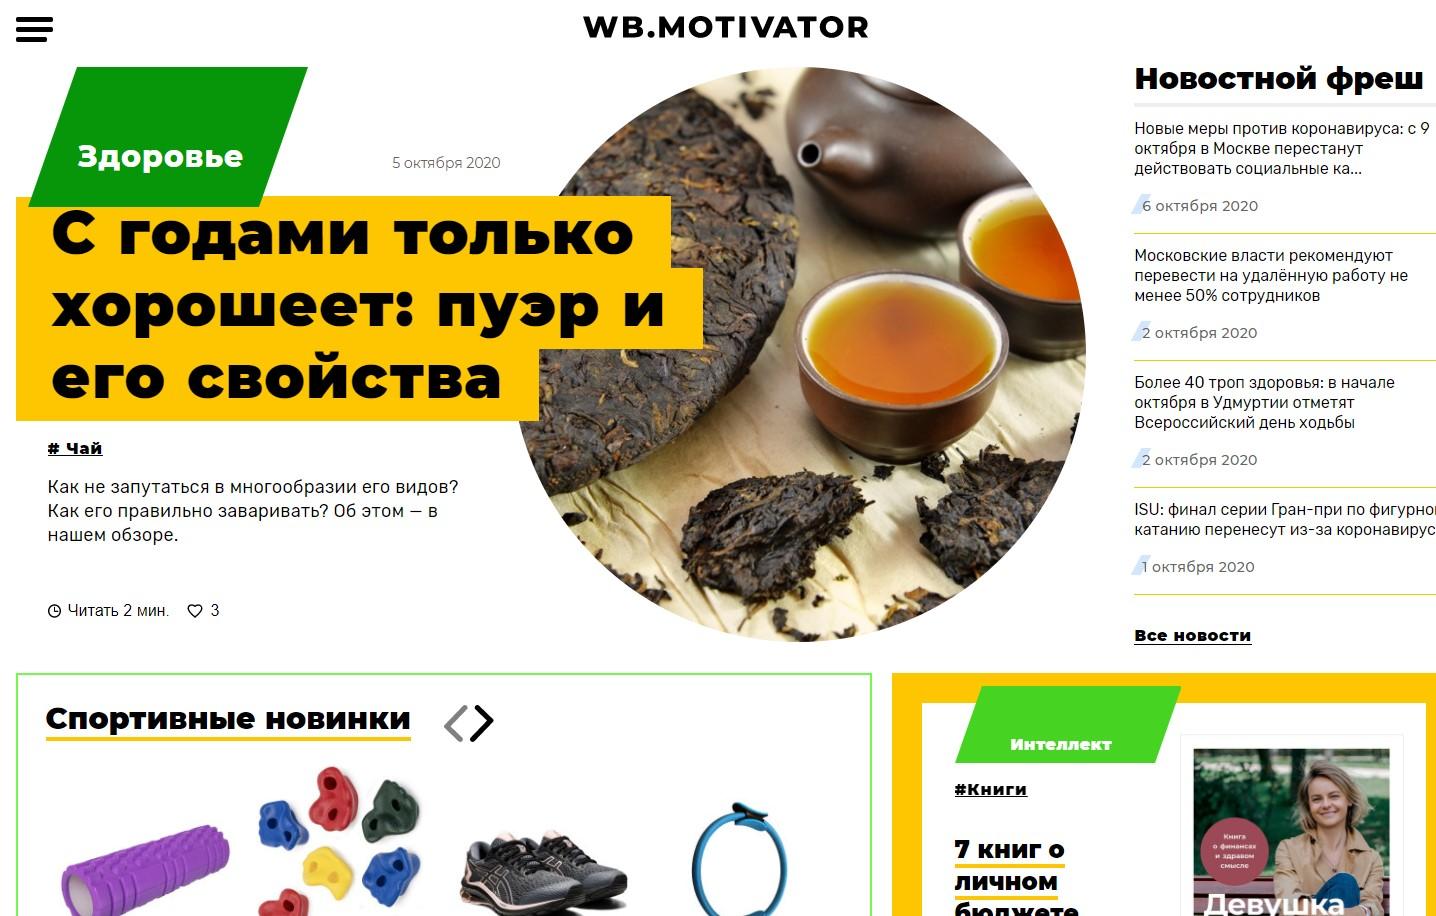 WBMotivator